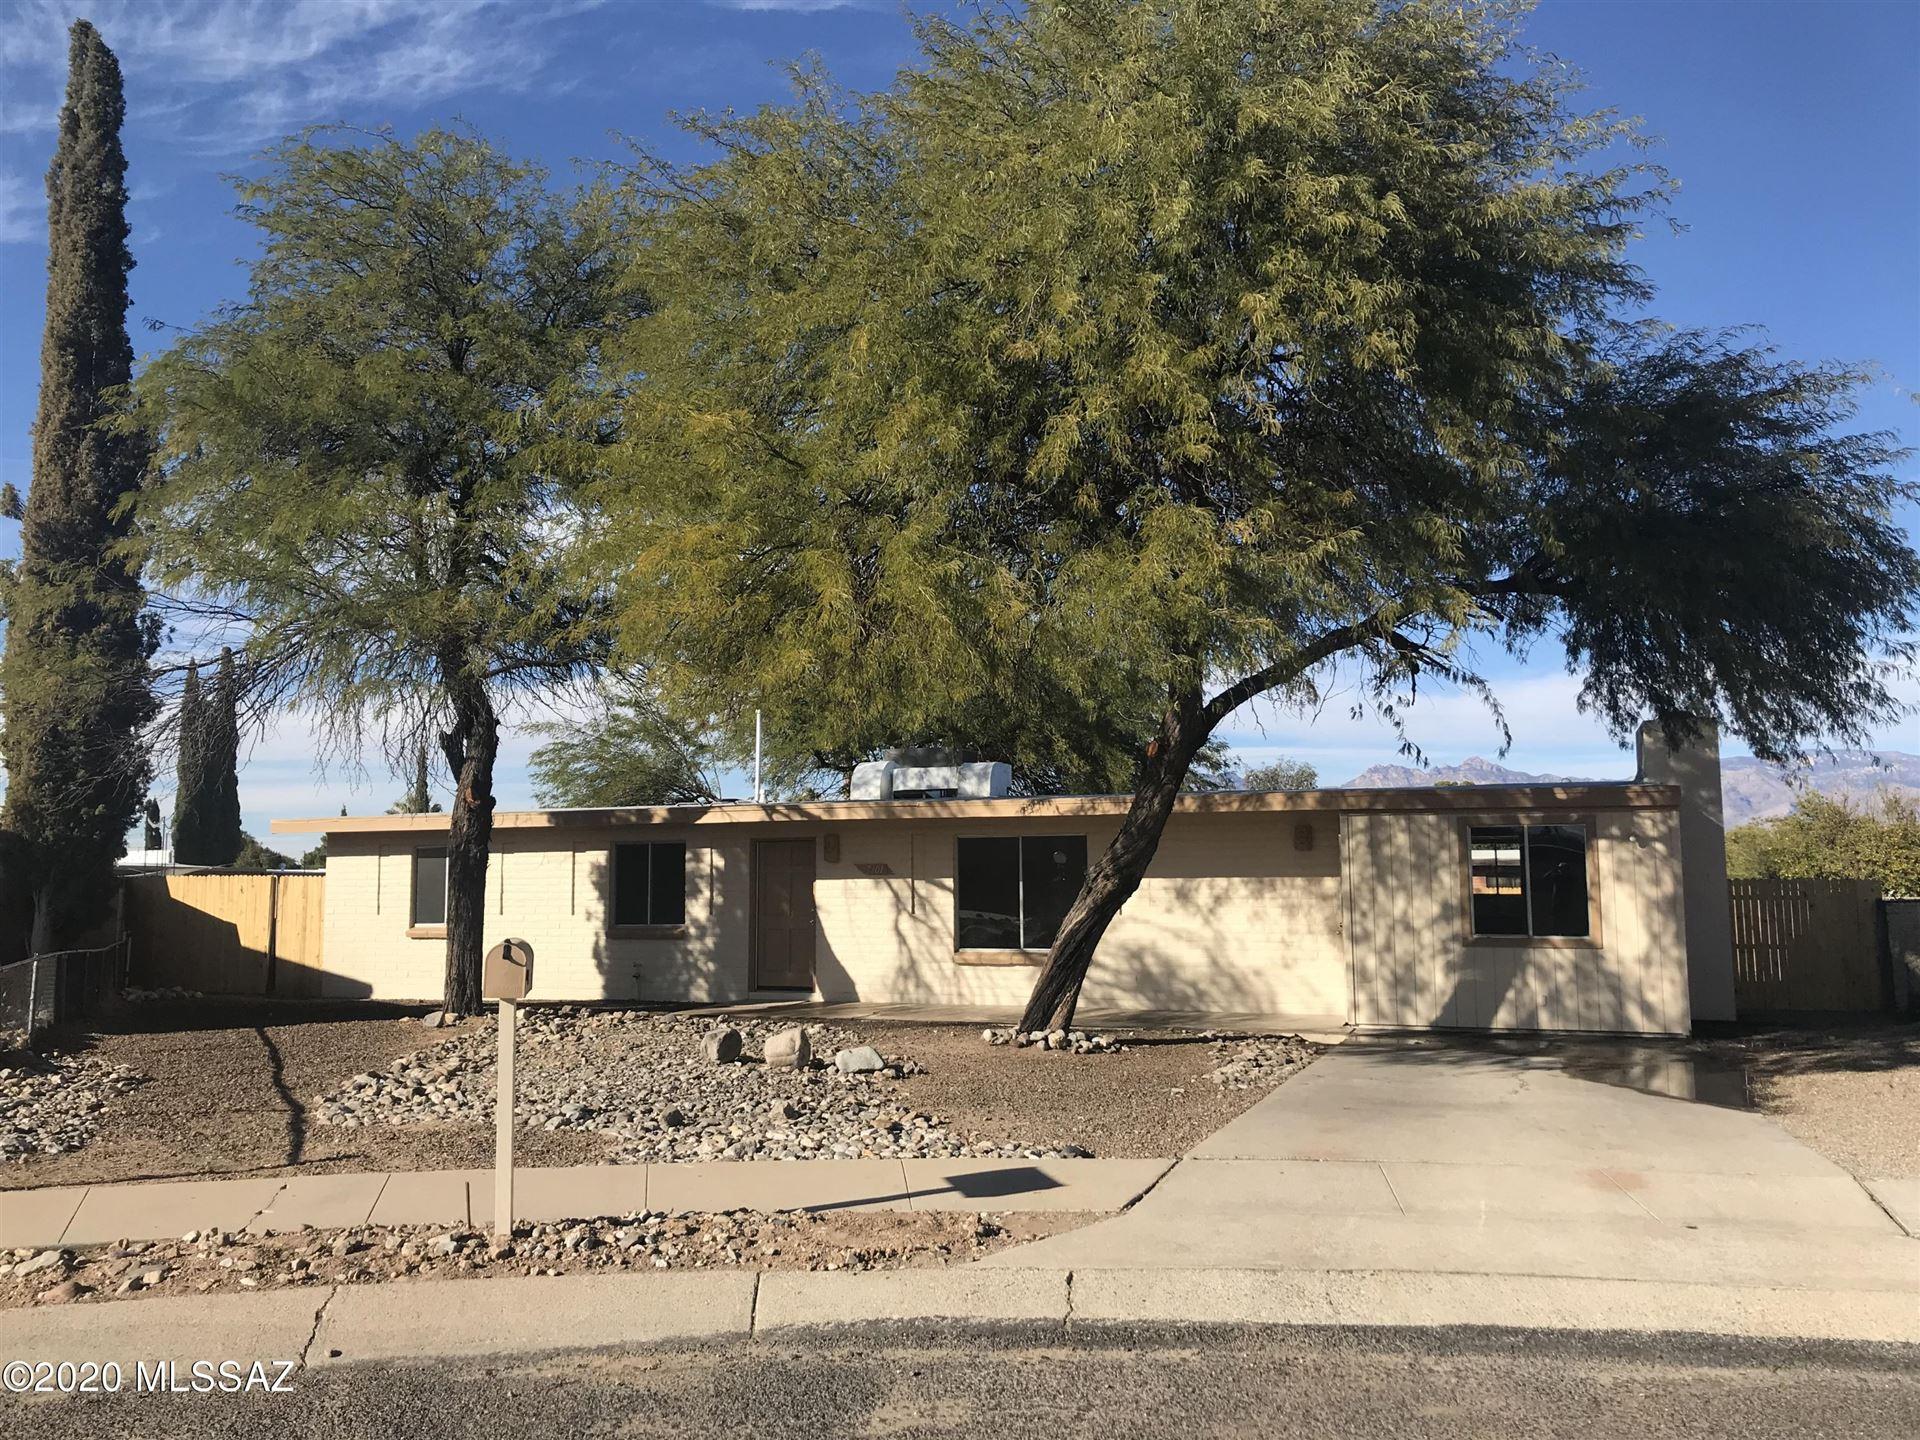 7301 E 42nd Street, Tucson, AZ 85730 - MLS#: 22030969